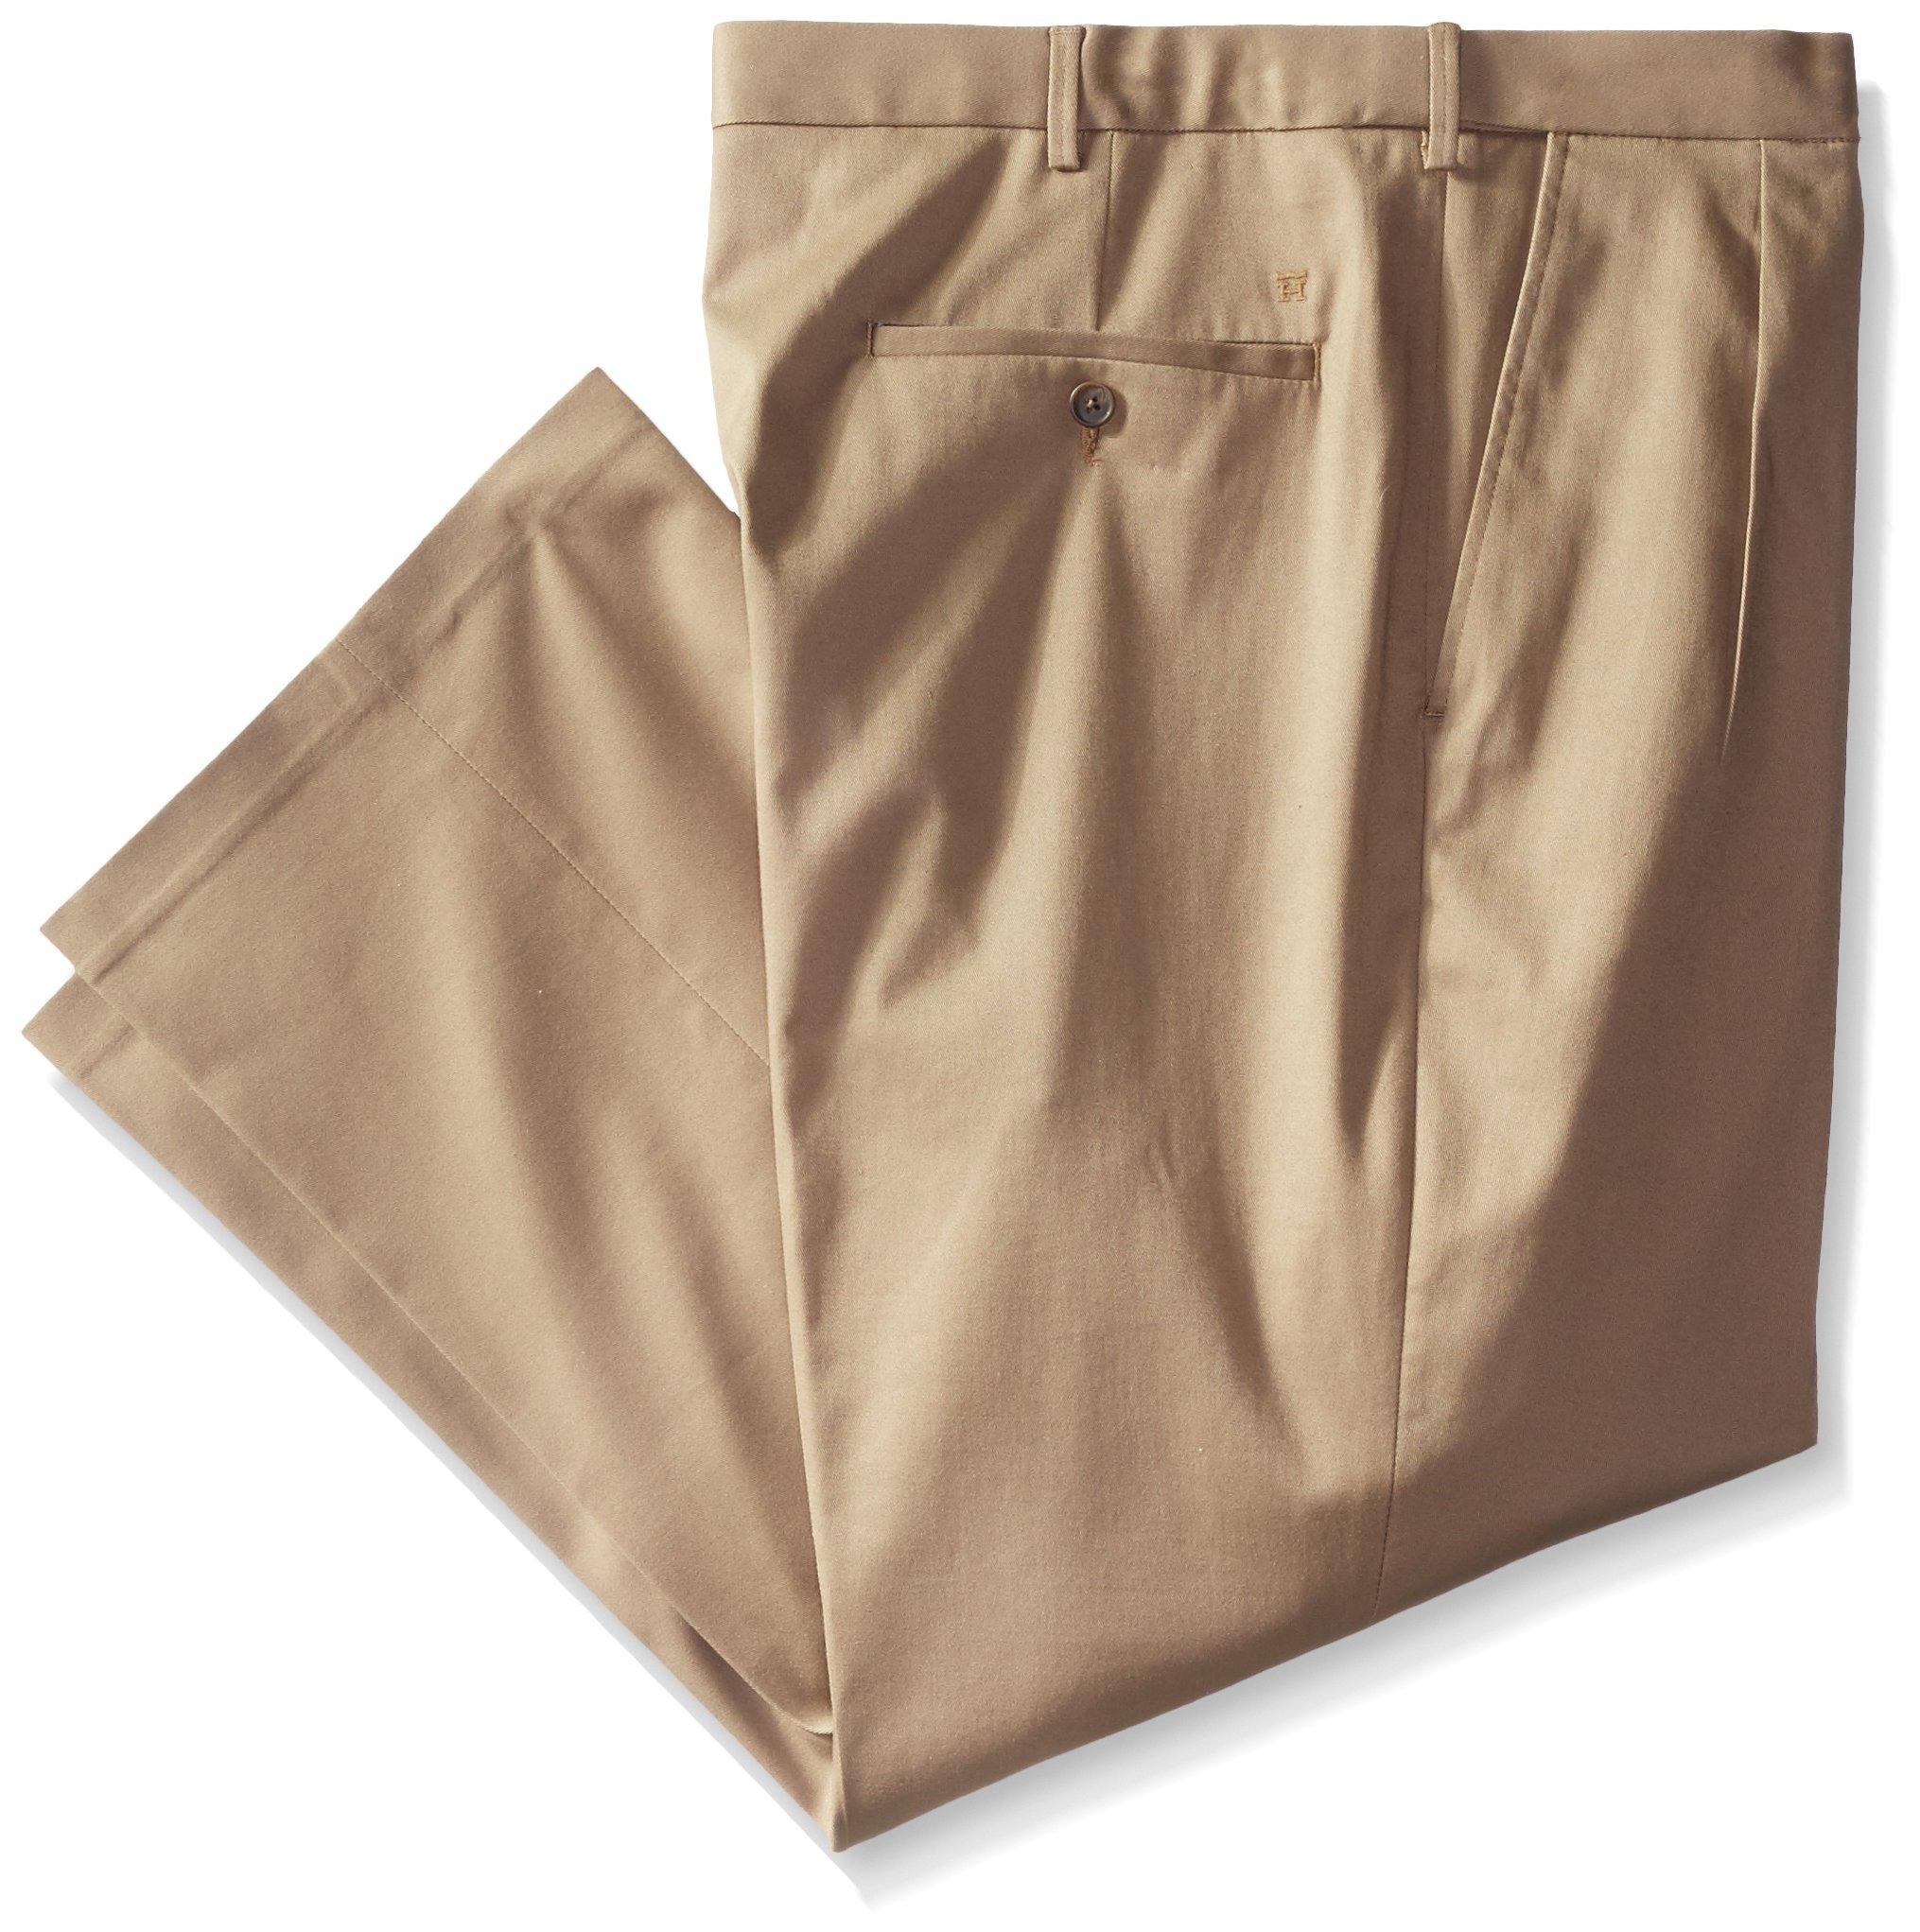 Haggar Men's Big-Tall Premium No Iron Classic Fit Pleat Front Pant, British Khaki, 44 x 34